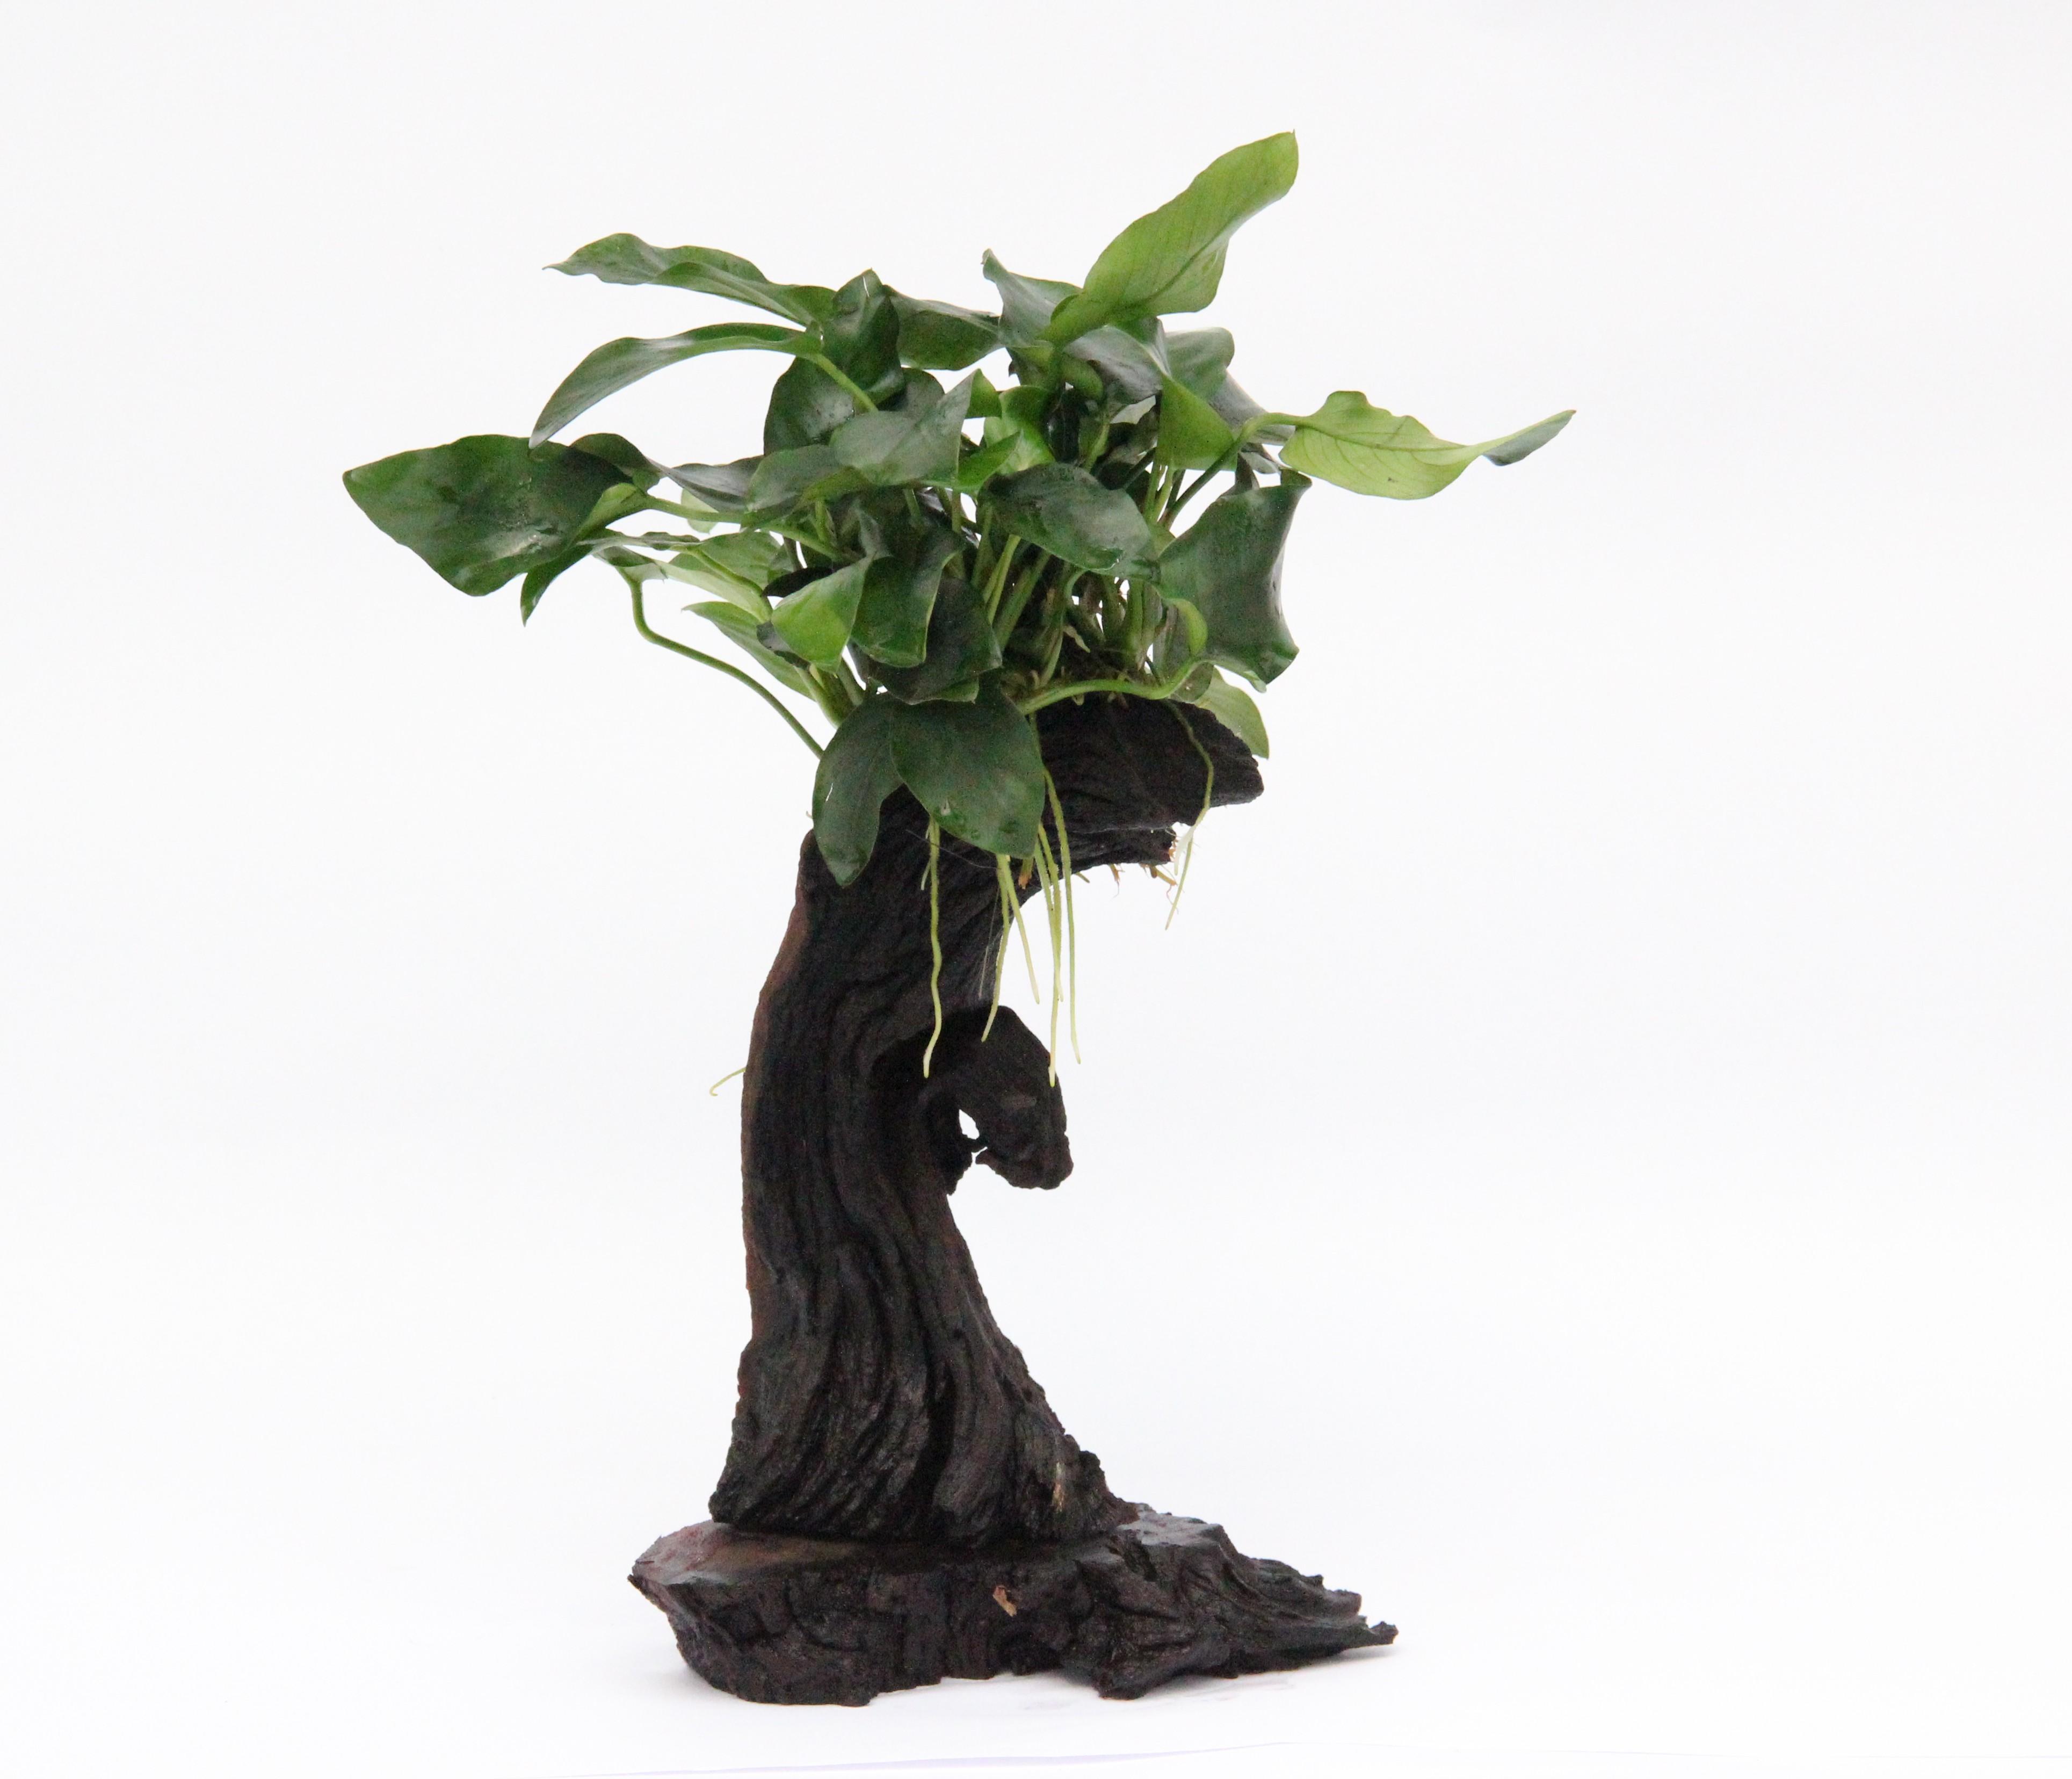 Dennerle Mbuna Anubias Tree Dennerle Aquarium Plant